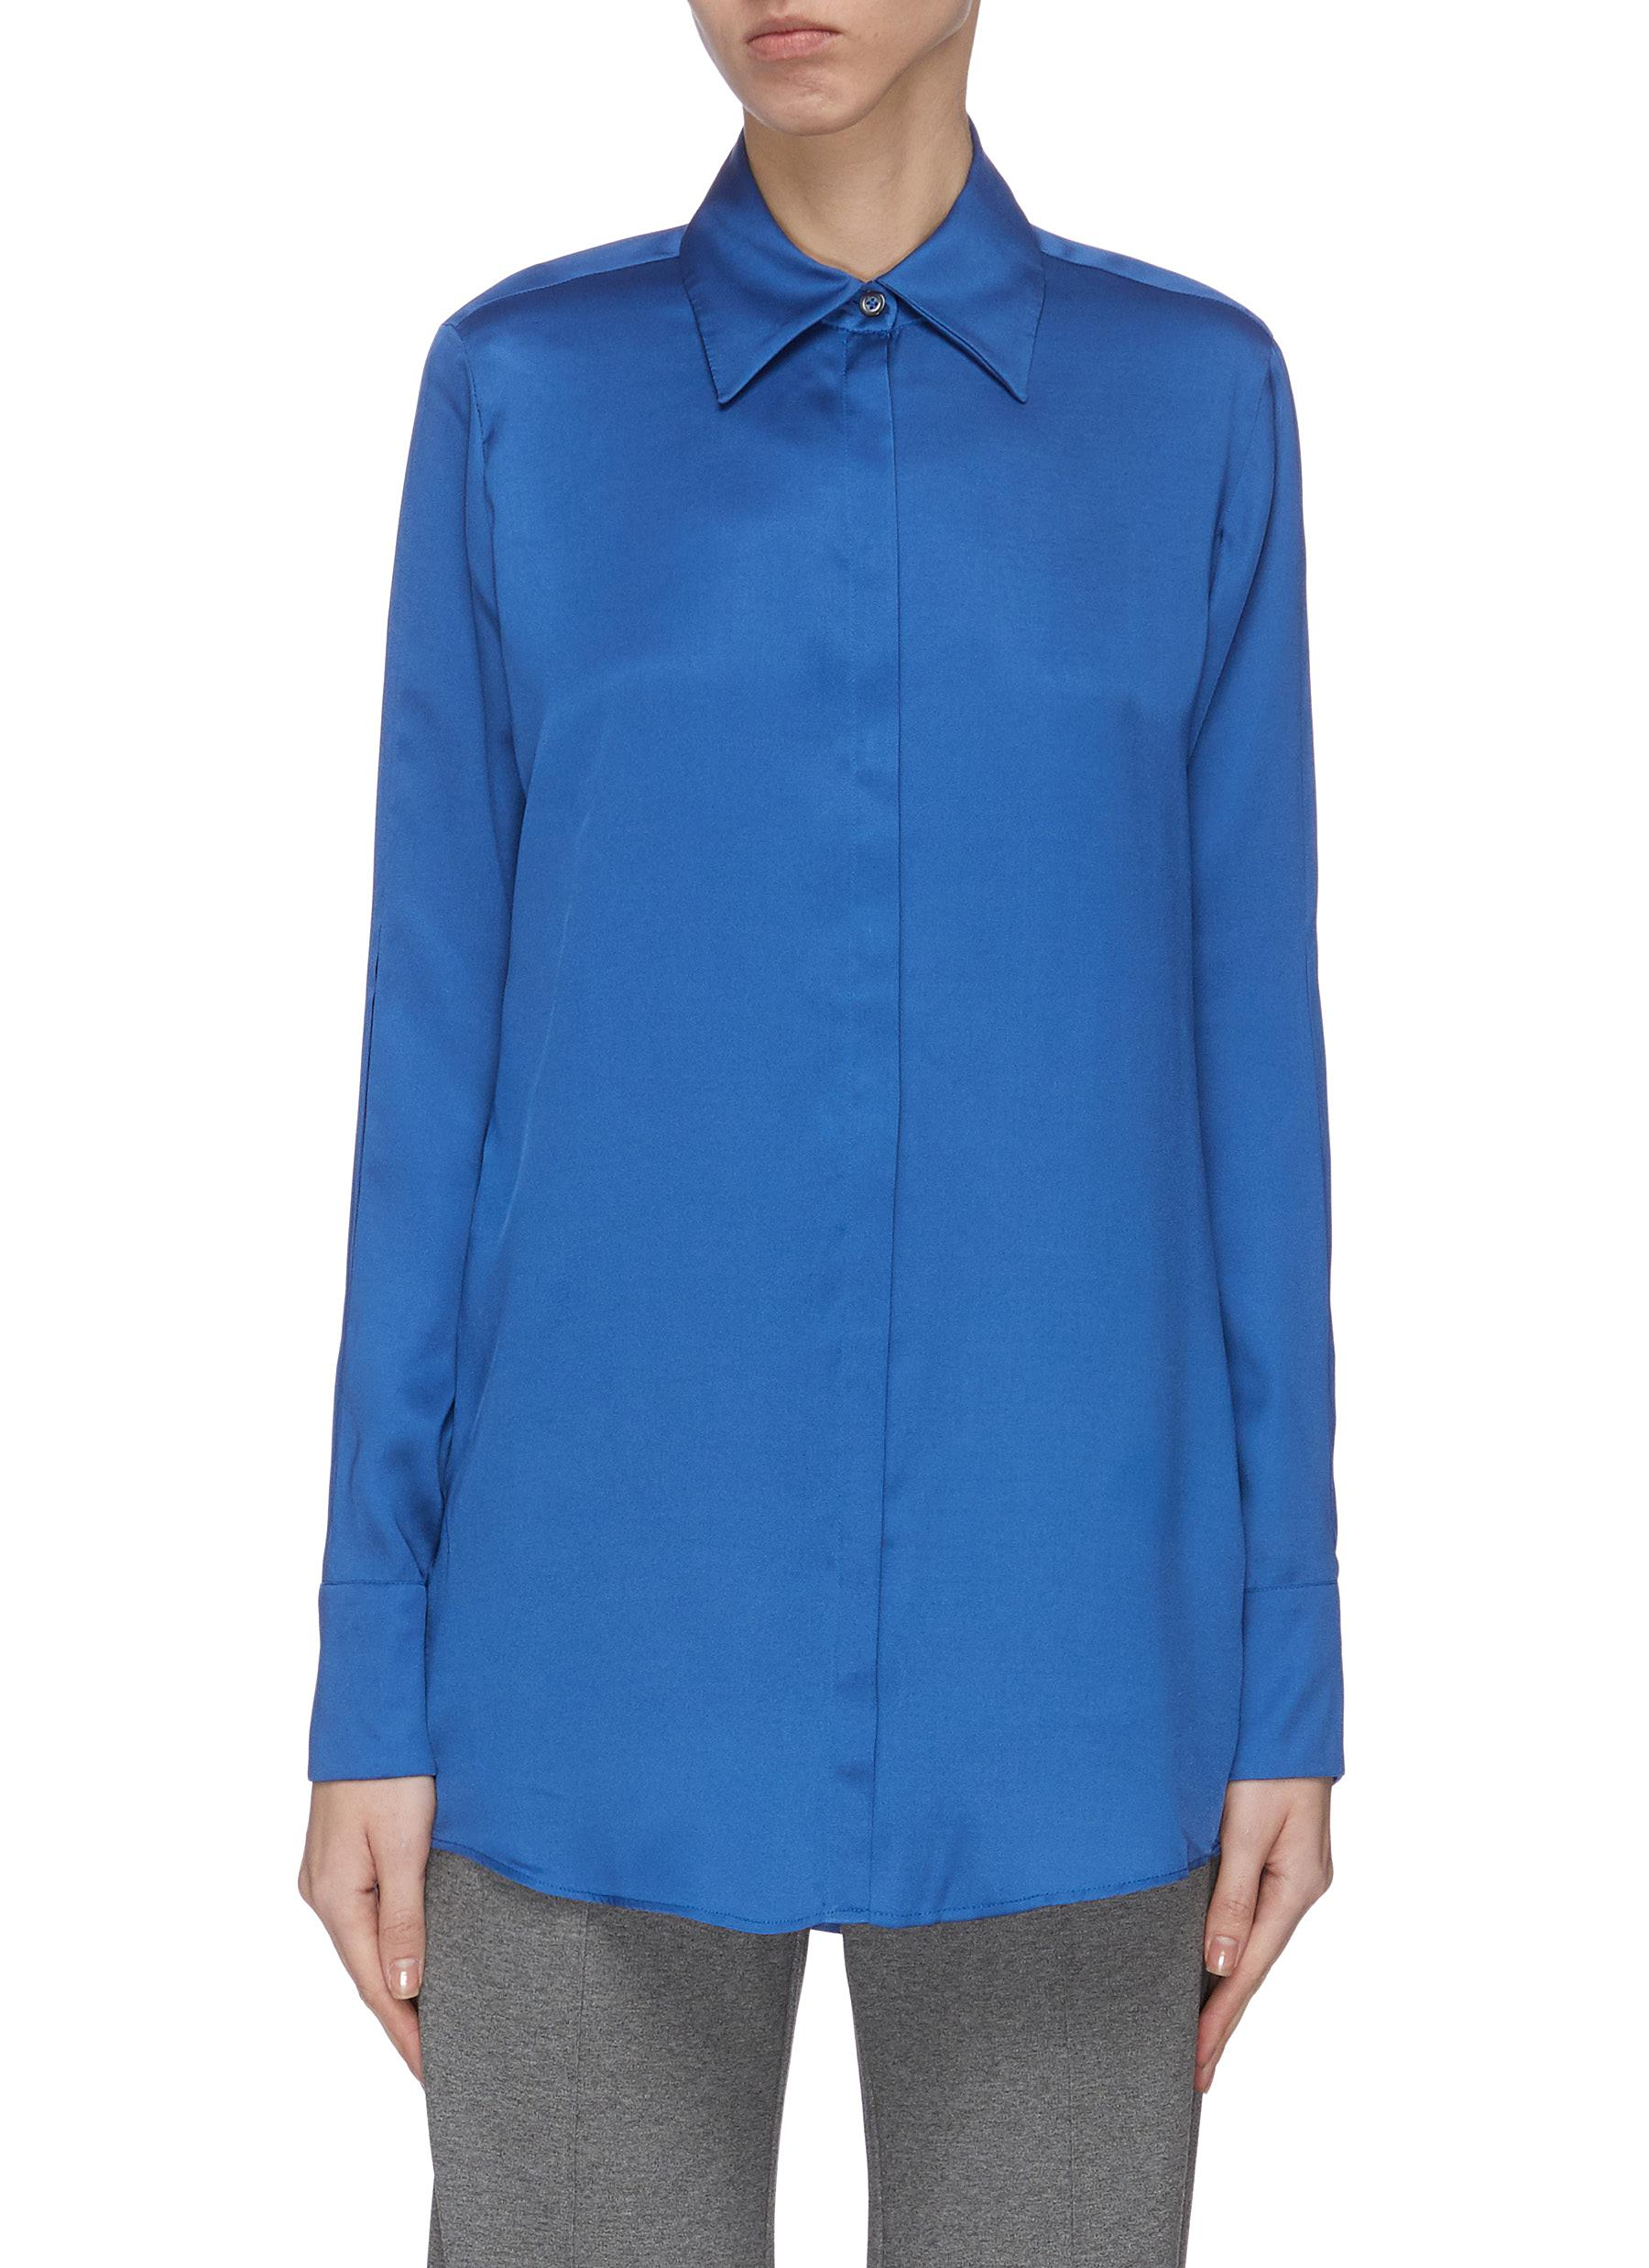 Buy Victoria, Victoria Beckham Tops Button down shirt